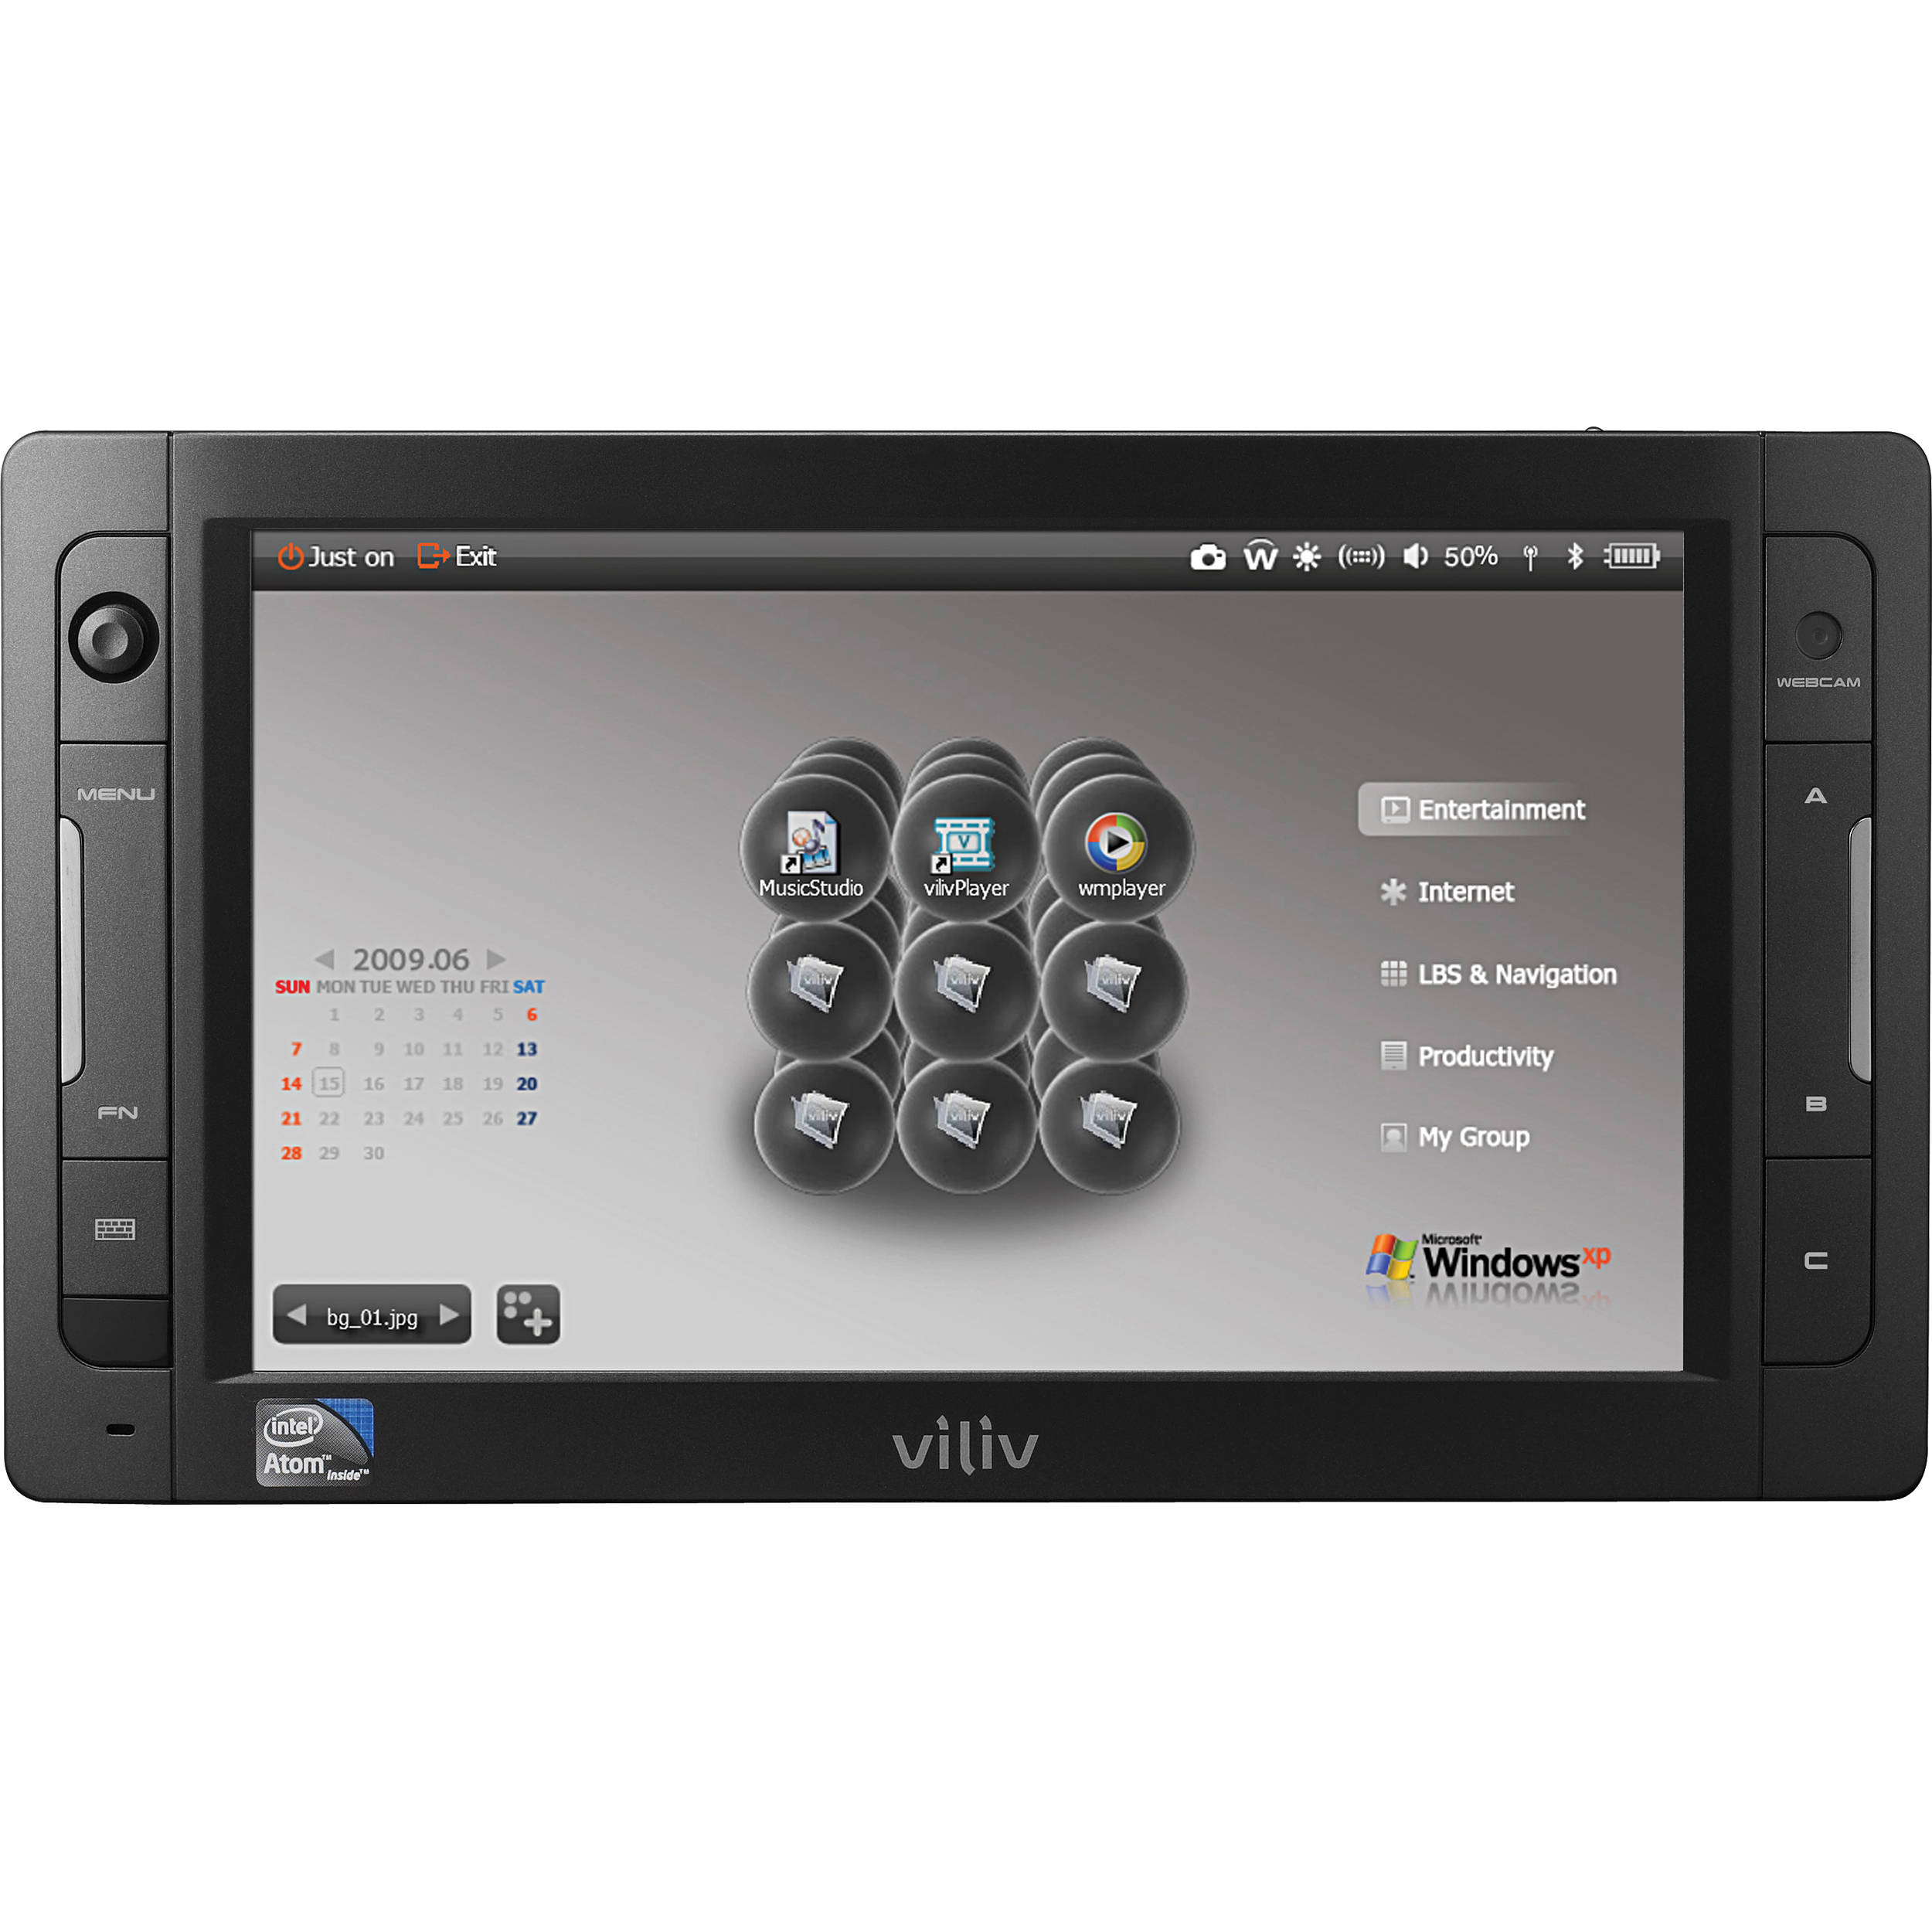 VILIV X70EX DRIVERS FOR WINDOWS 7